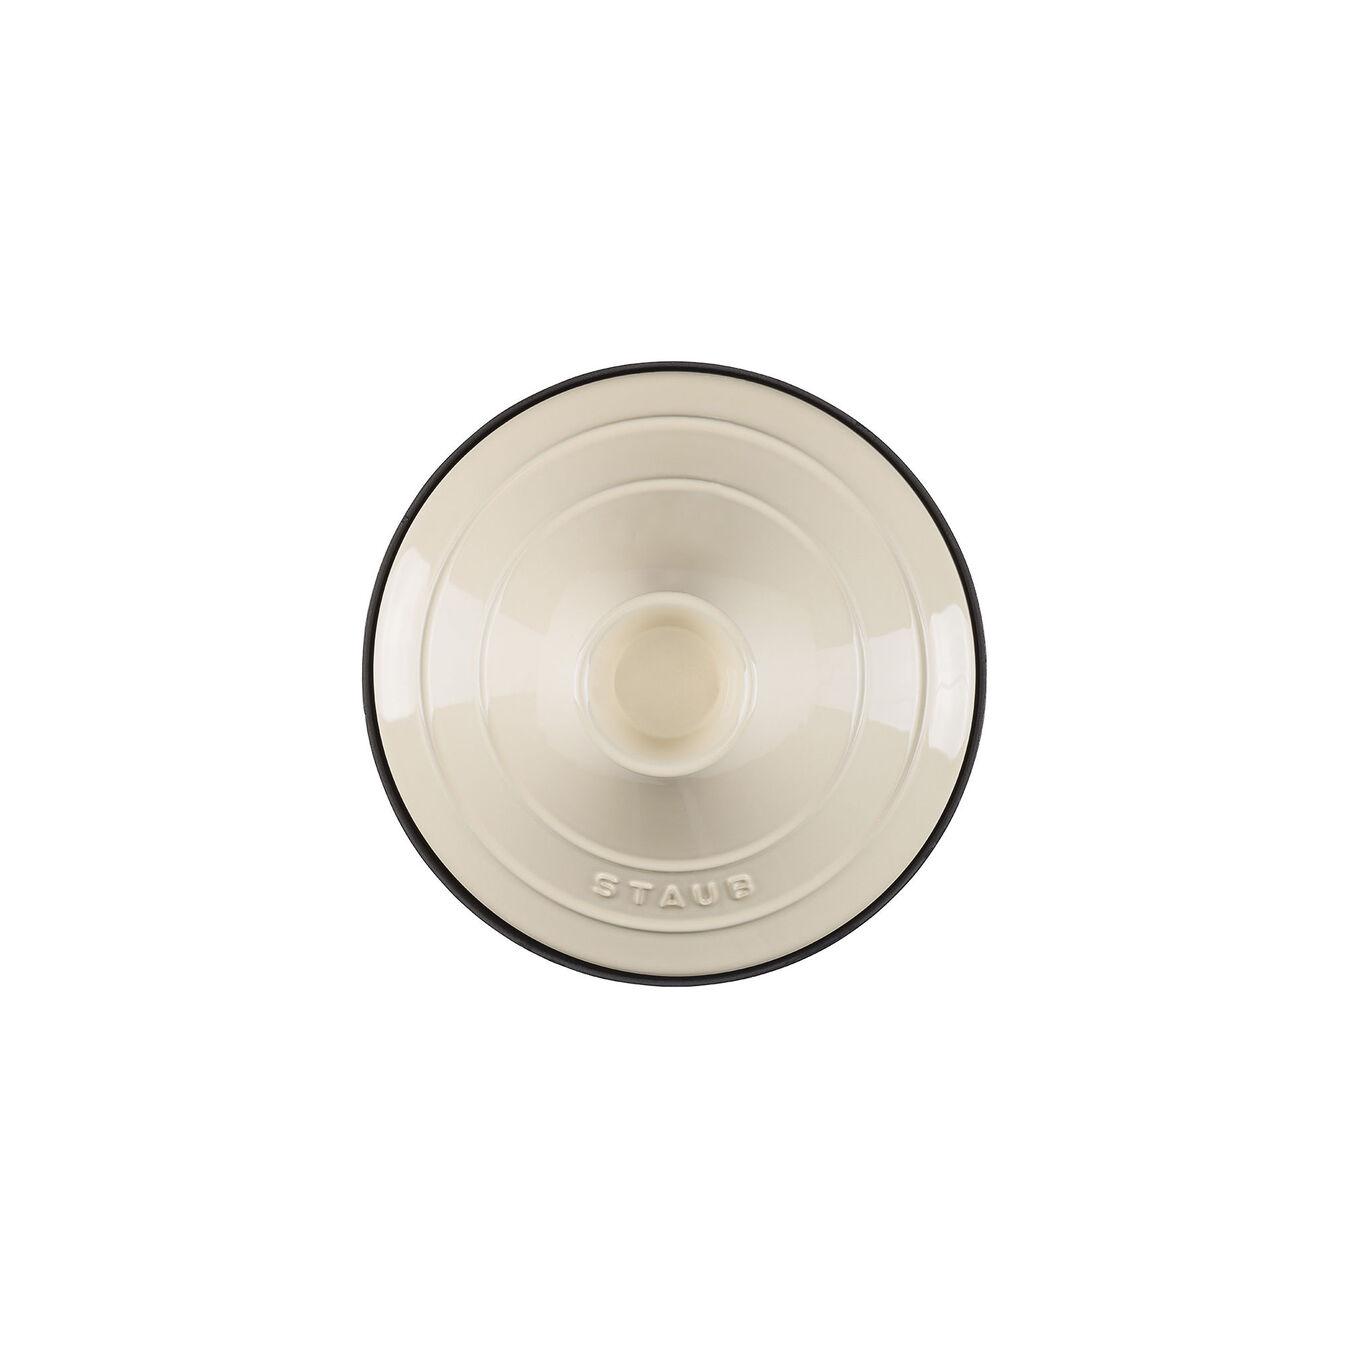 Tajine 20 cm, Gusseisen, Cream,,large 3